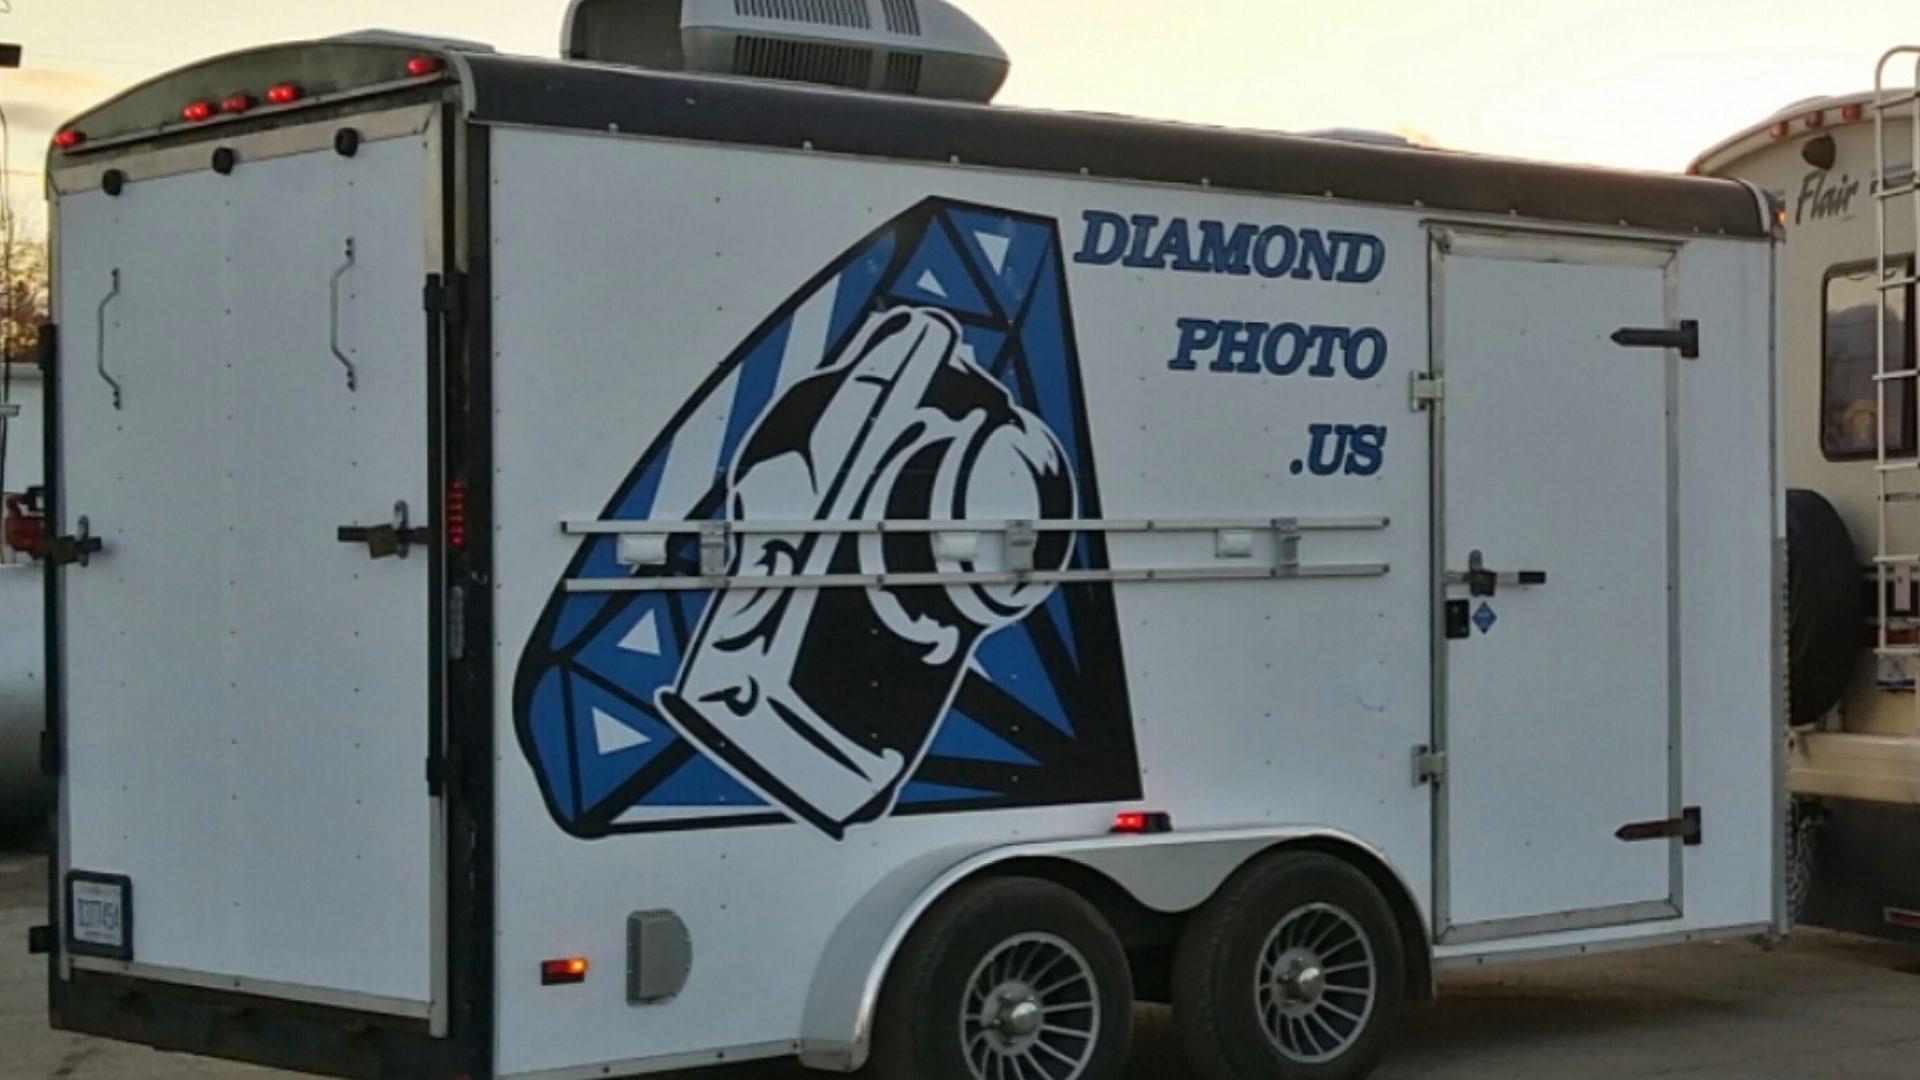 Diamond Photo - Small Trailer Graphics (1)